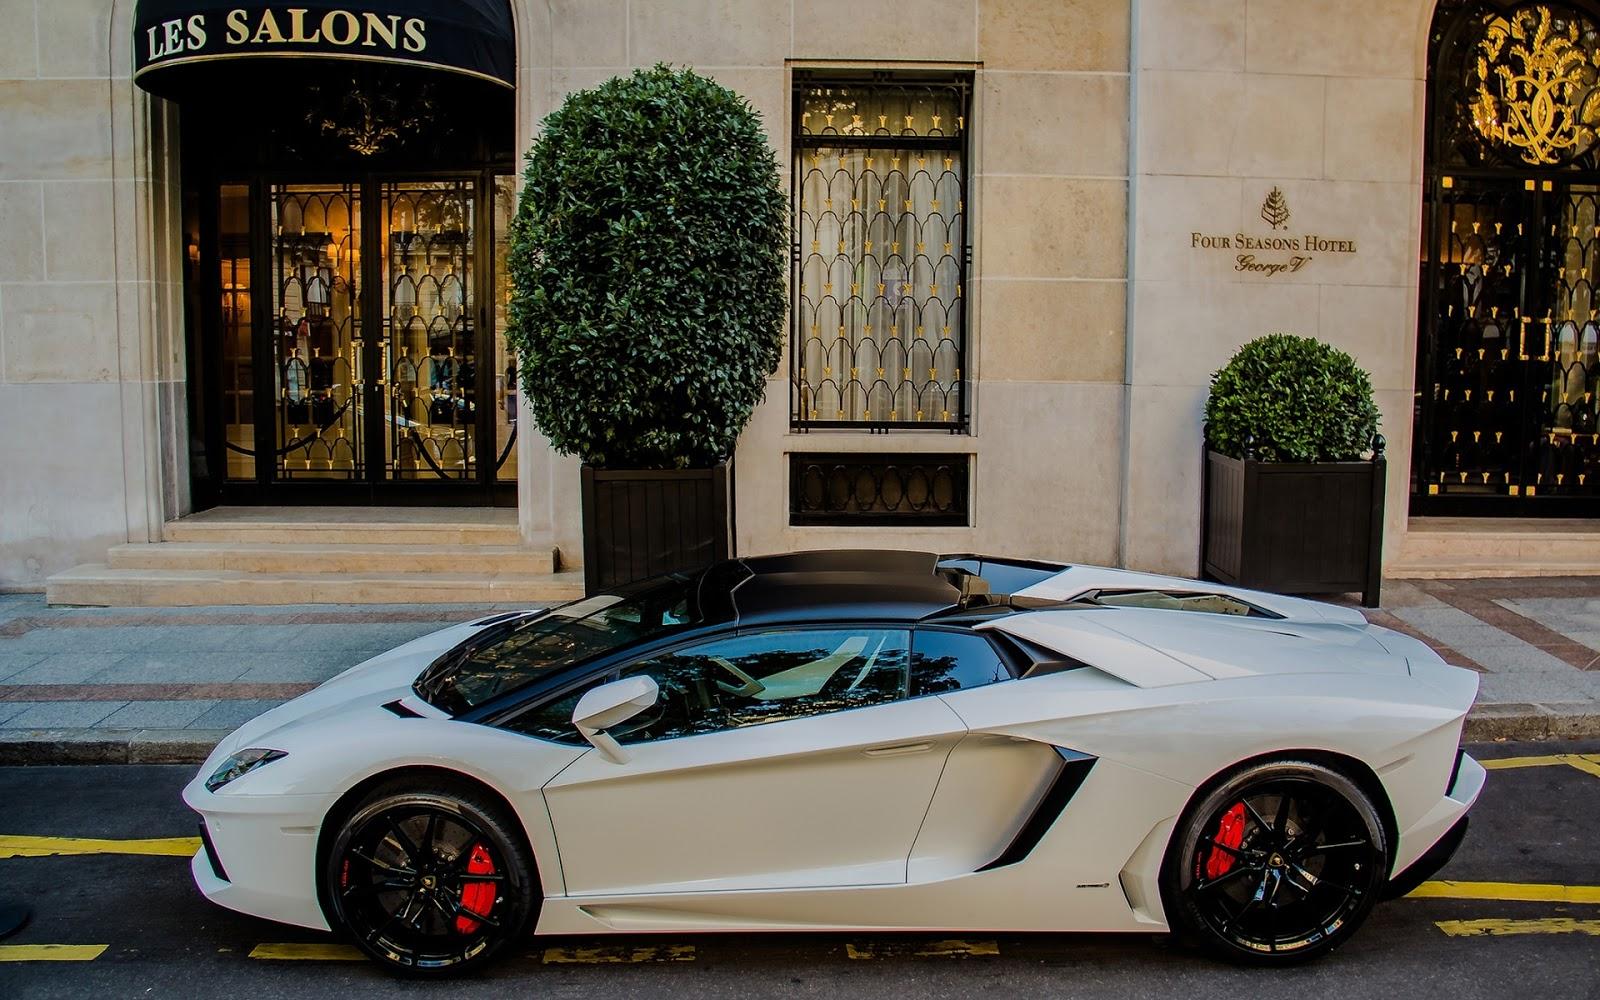 White Lamborghini Aventador Autos Y Motos Fascinantes